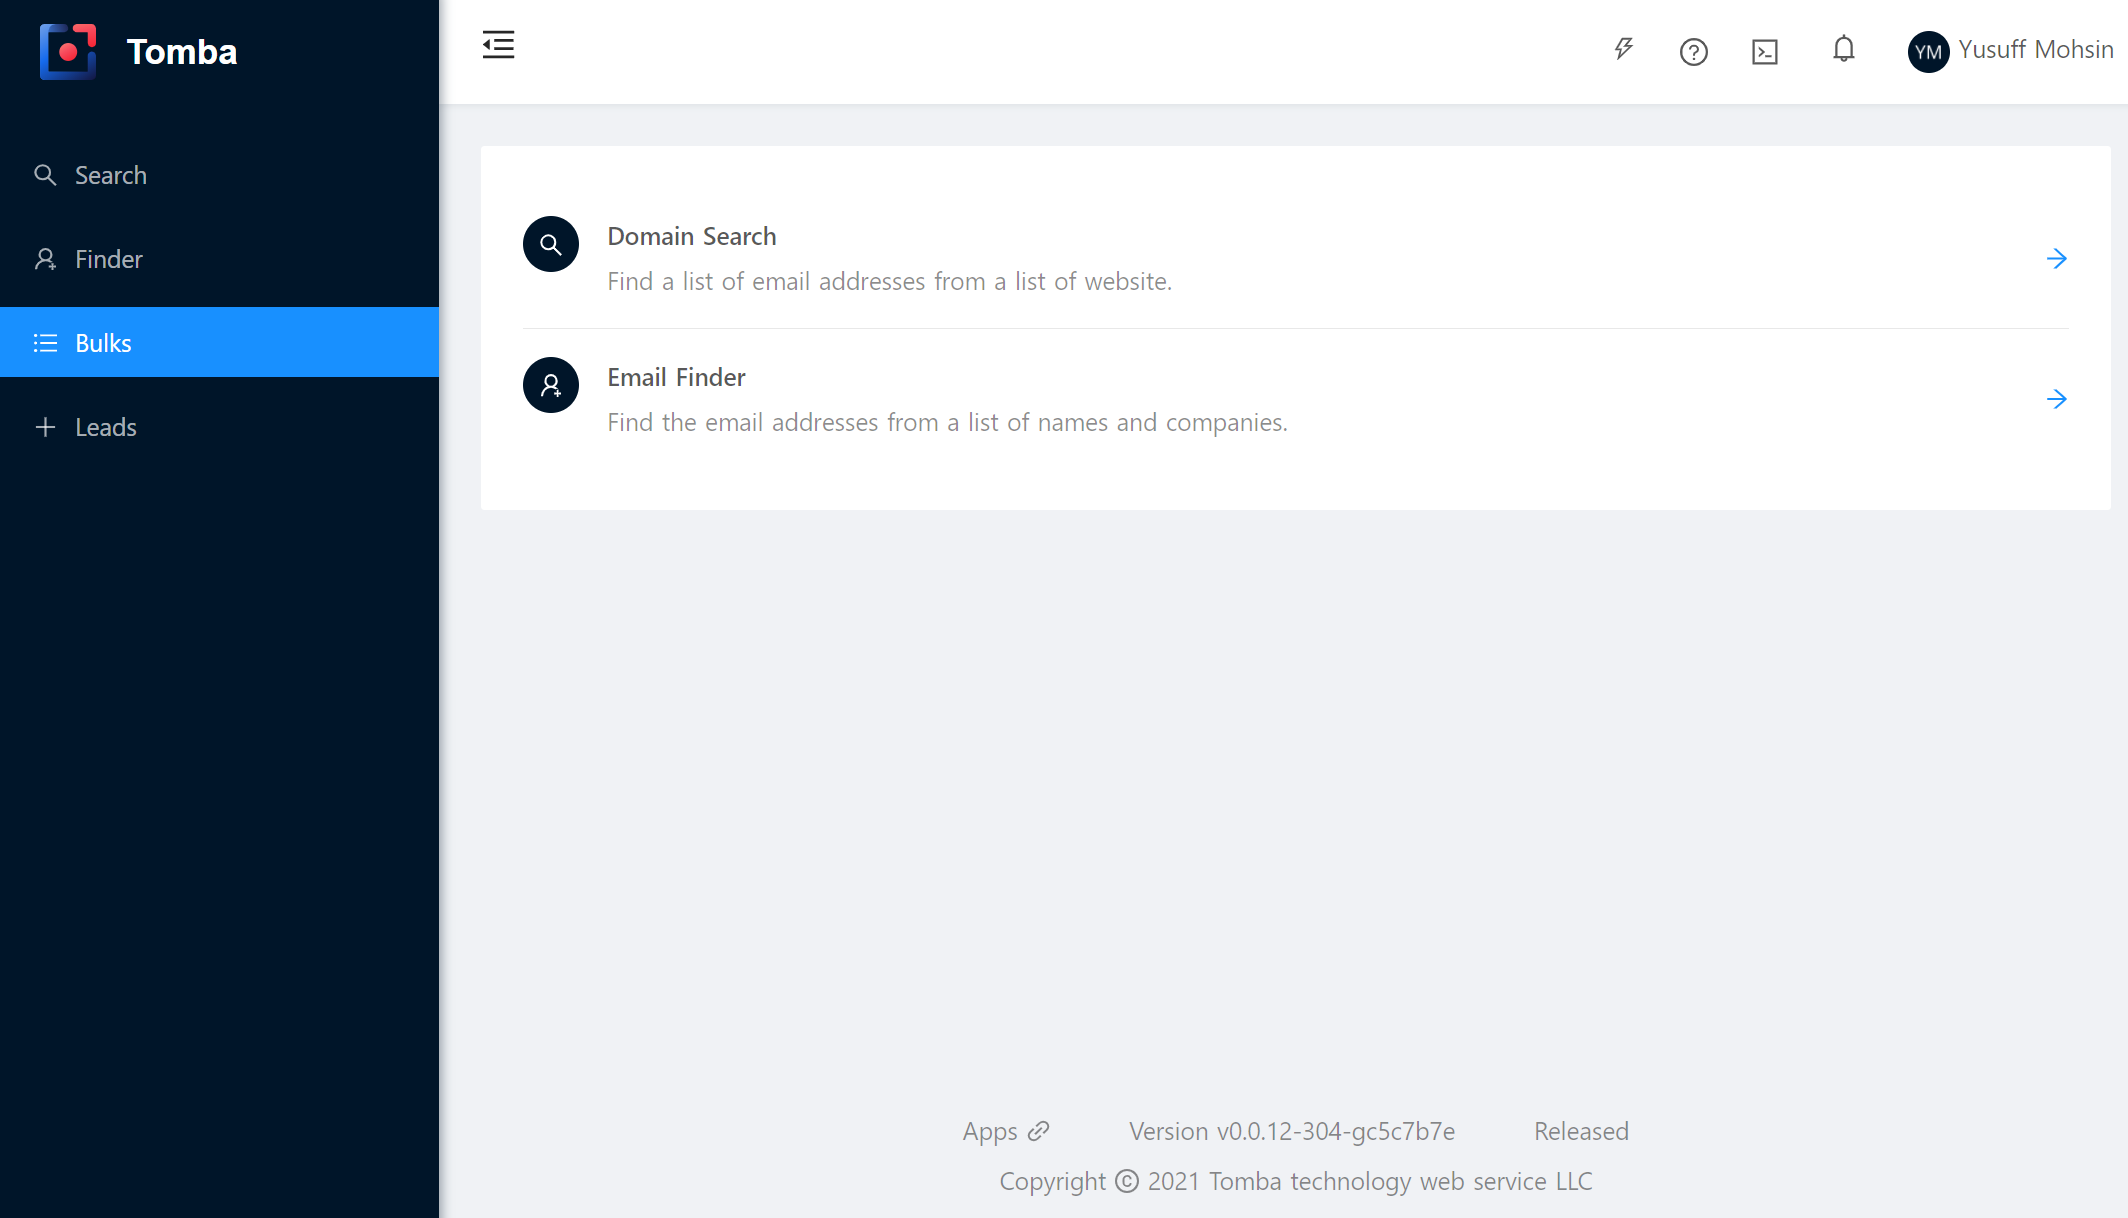 Tomba.io - Bulk Email Search